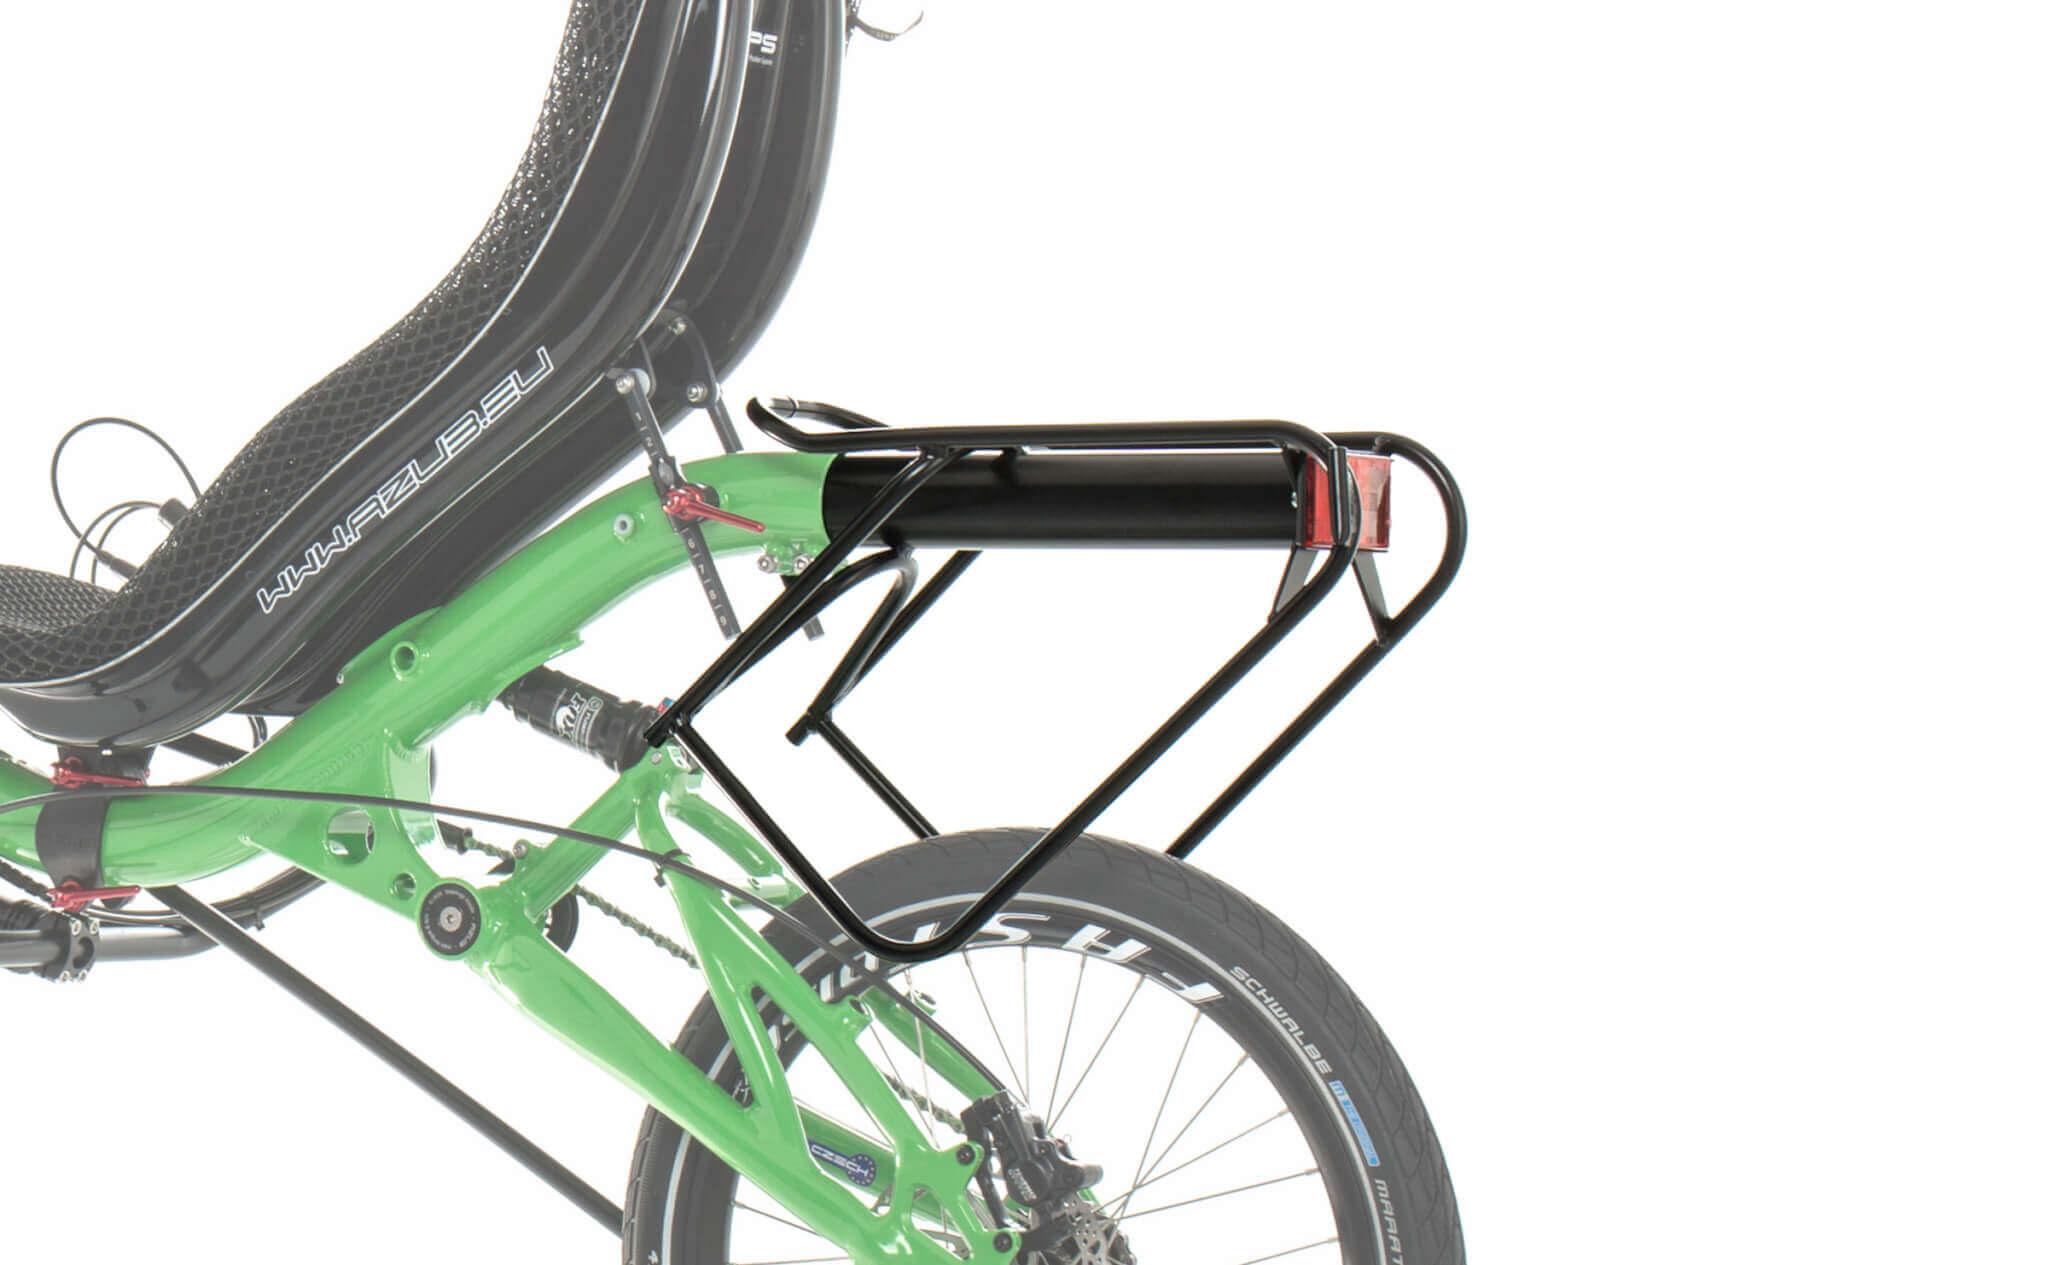 bike-standard-carrier-rack-for-azub-mini-max-six-bufo-ibex-apus-twin-nosic-pro-lehokolo-azub-on-bike